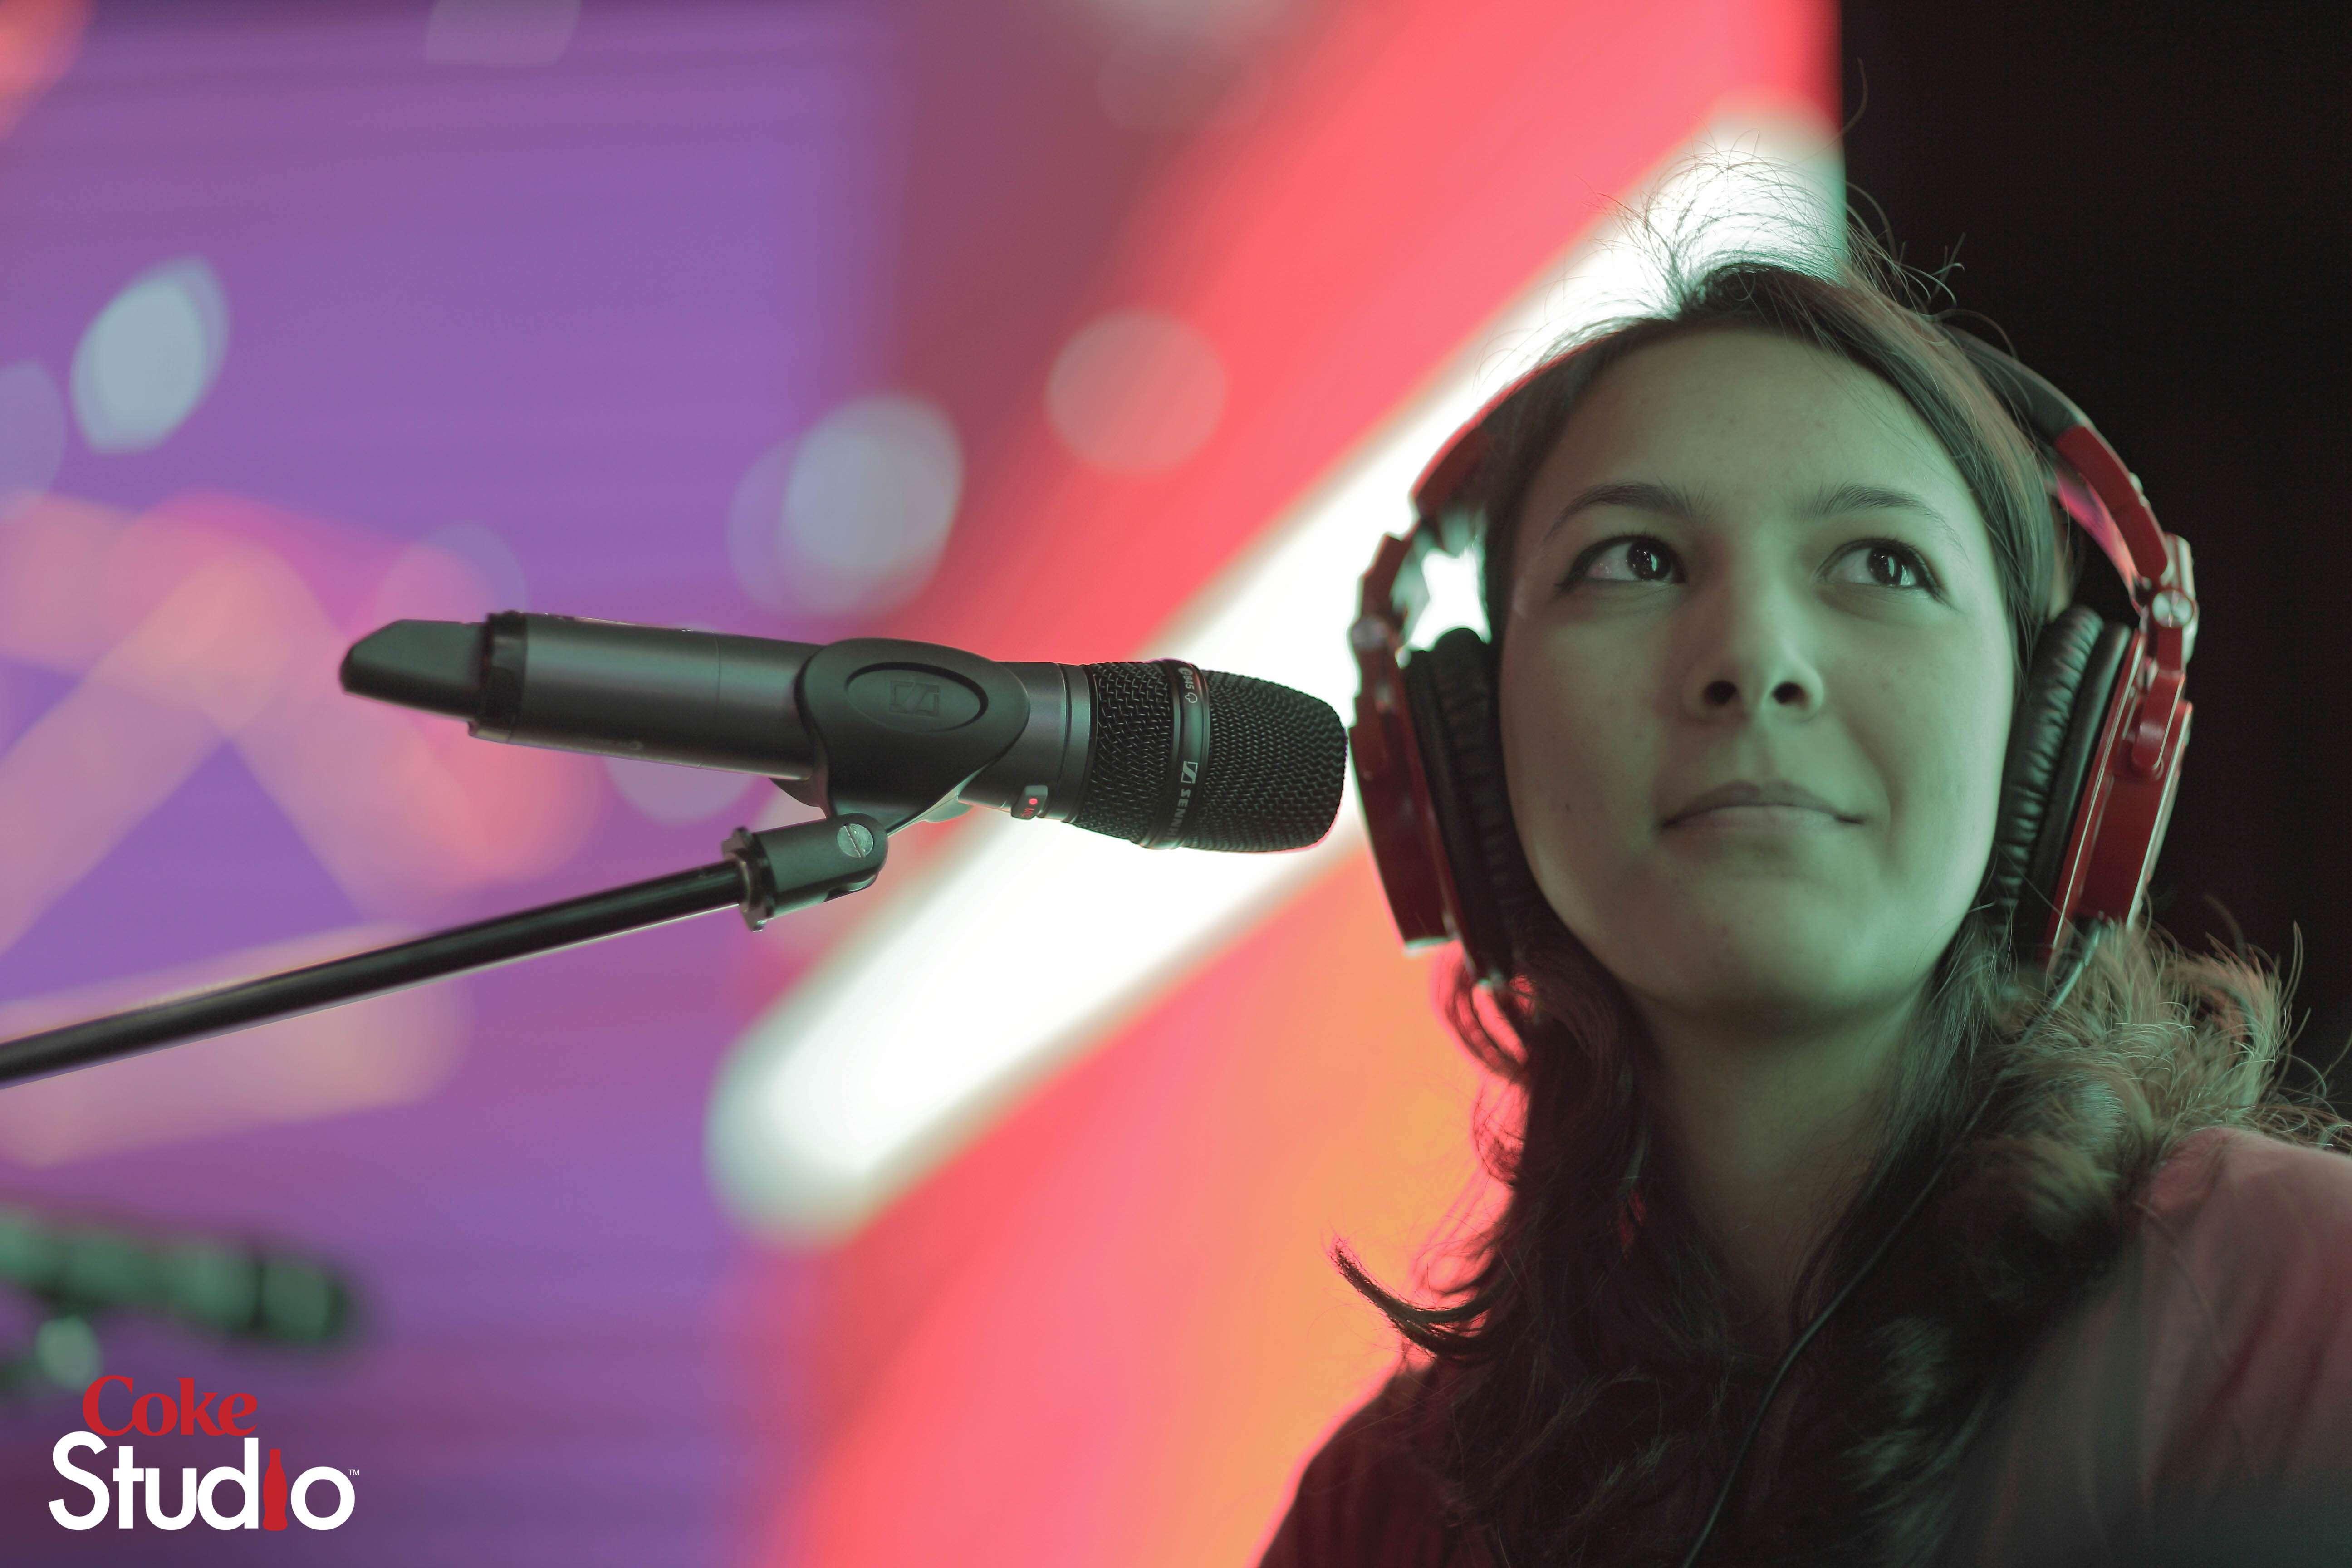 Zoe-Viccaji-featured-artists-coke-studio-season-7